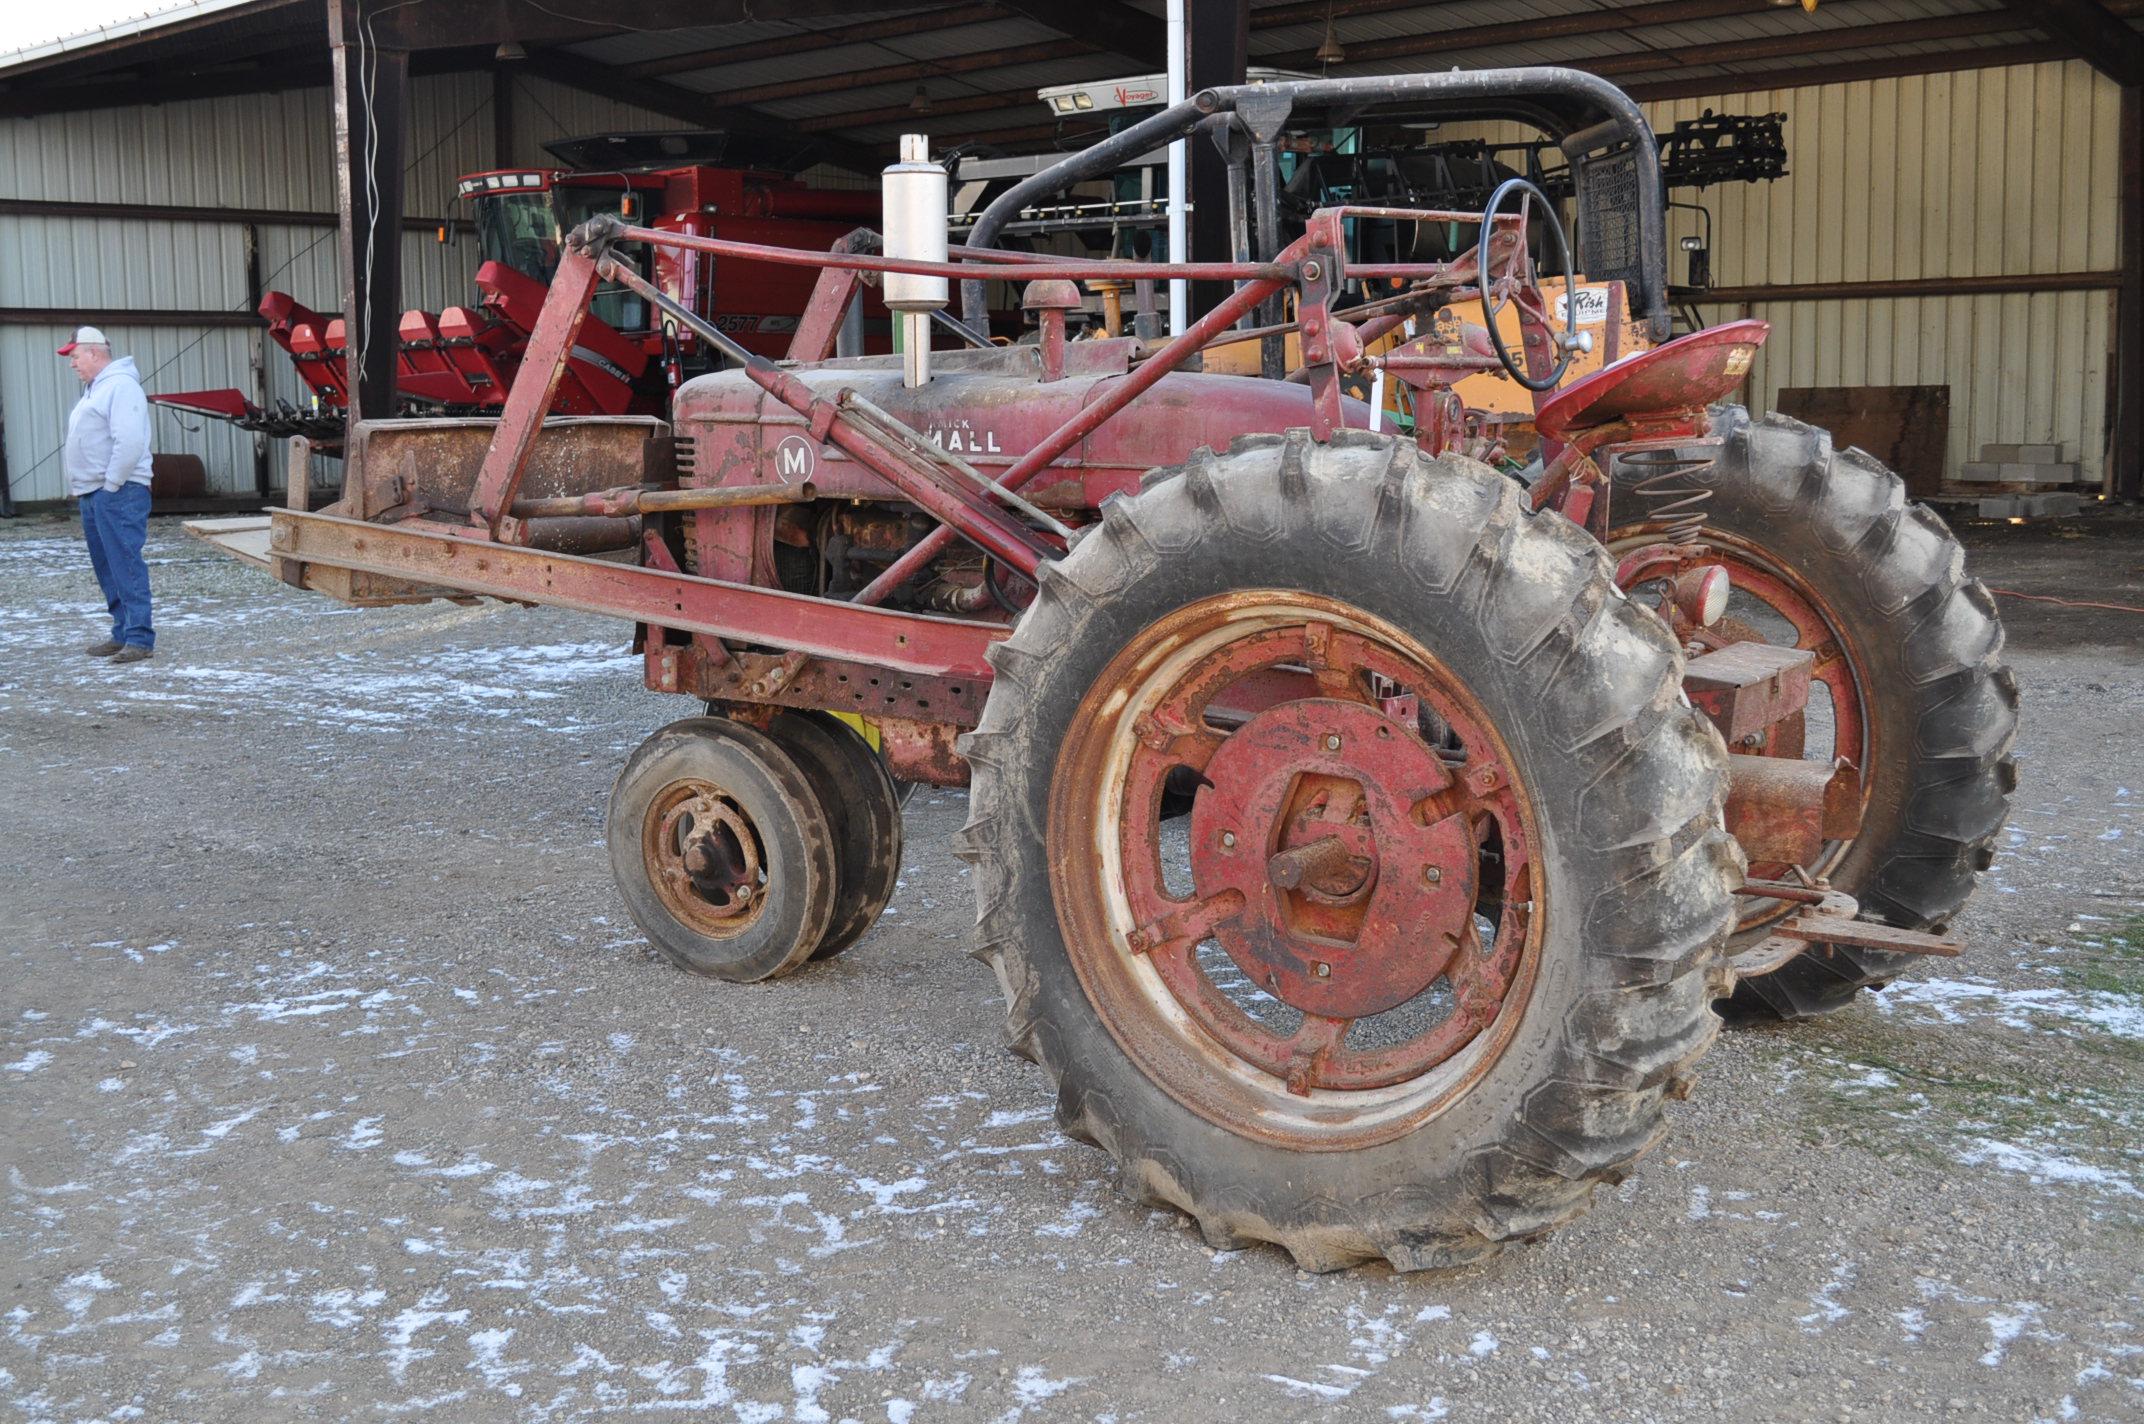 Farmall M tractor, 13.6-38 rear, narrow front, gasoline, loader, 540 PTO, SN FBK276 - Image 2 of 11